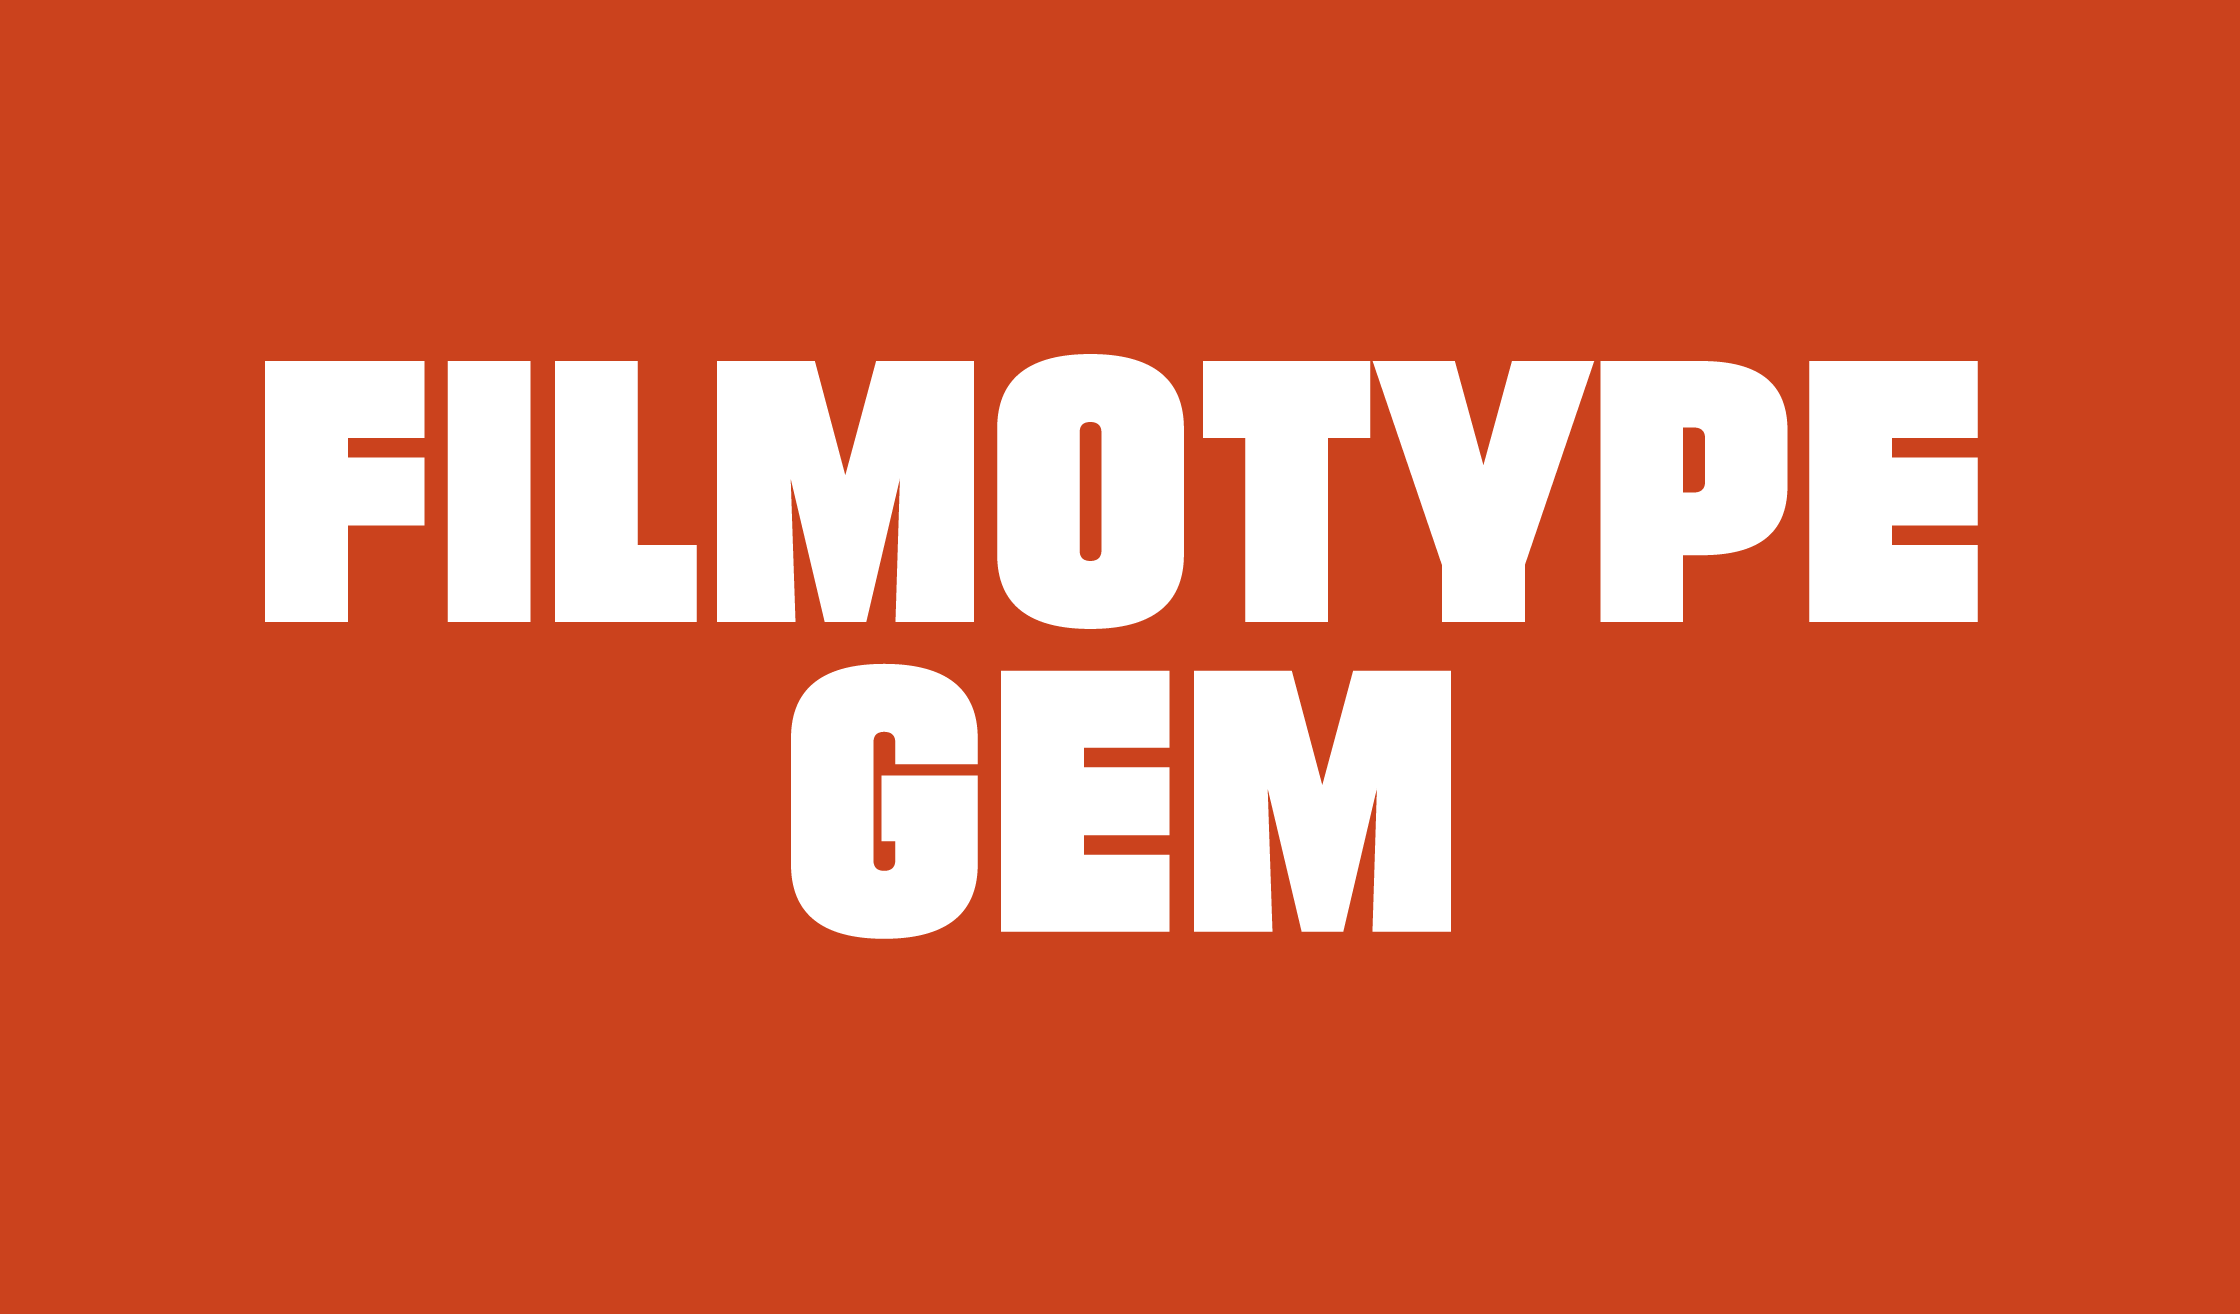 Filmotype Gem Font - iFonts xyz